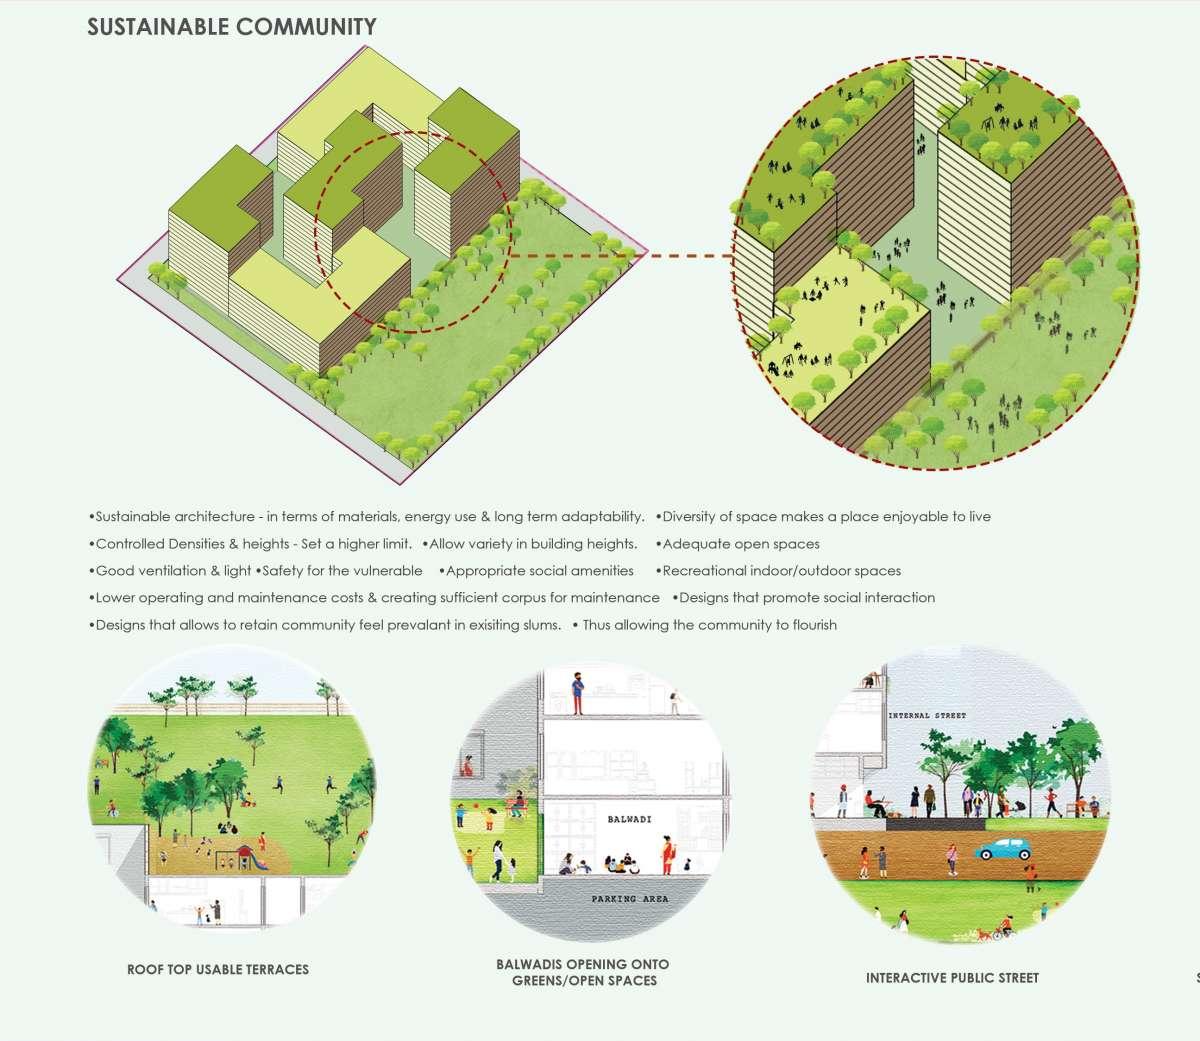 Formalising the Informal: Potential of Self-Development of Slum Communities by Rahul Kadri of IMK Architects